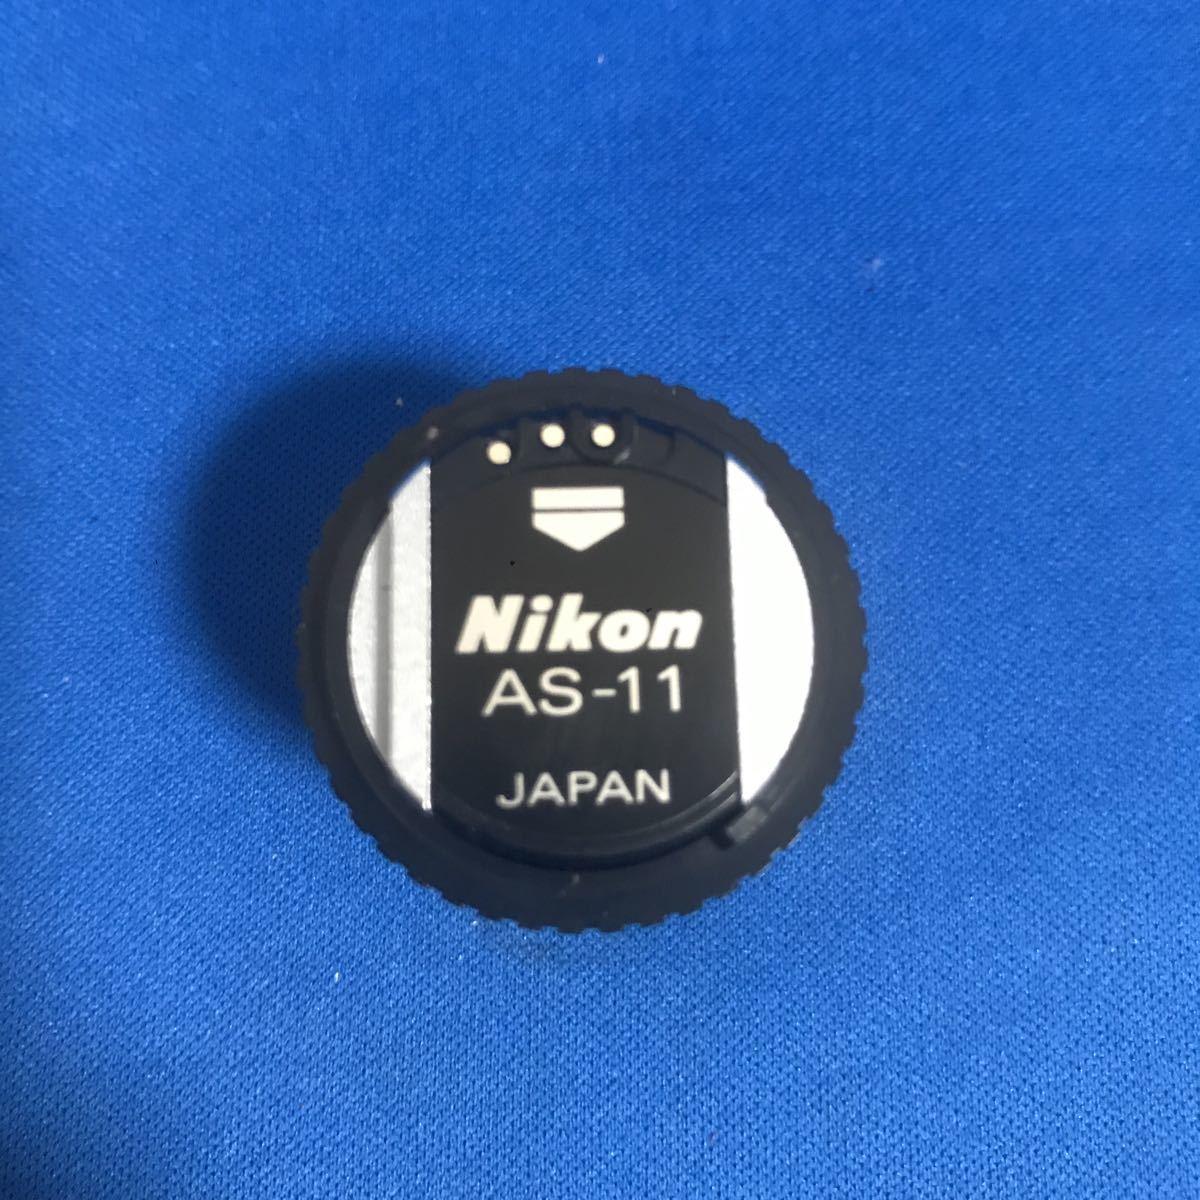 NIKON Nikon AS-11 tripod adaptor